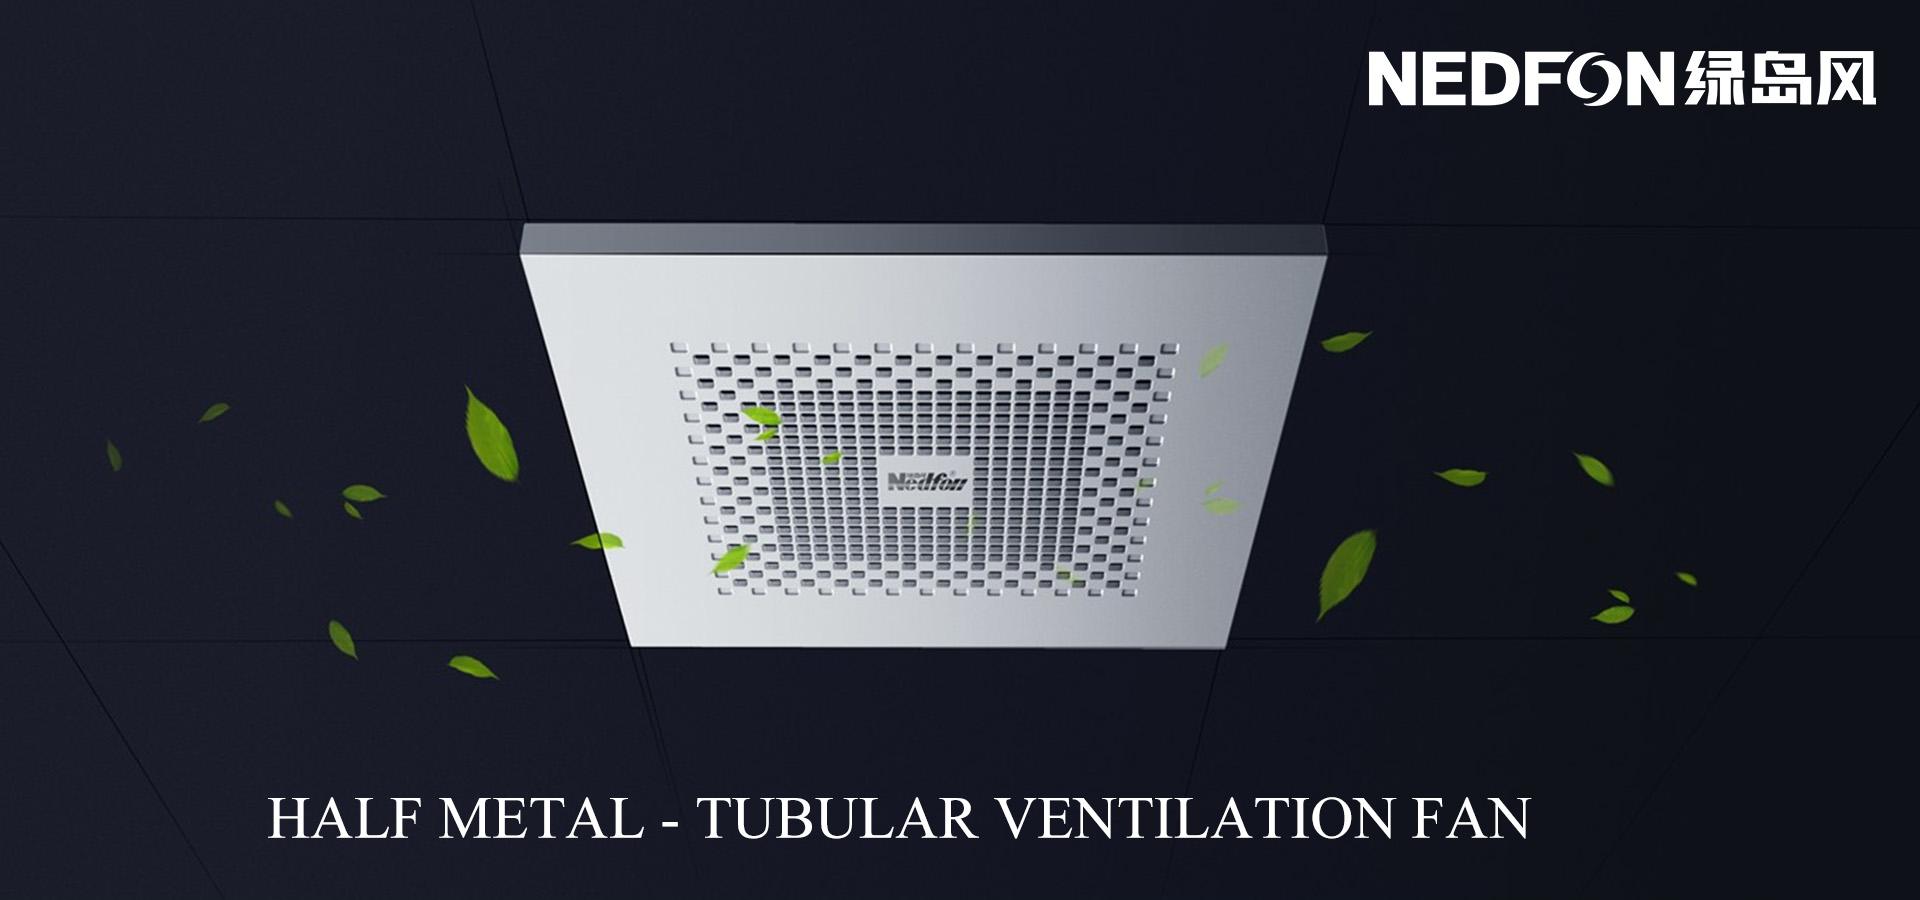 new-tubular-vent-fan.jpg